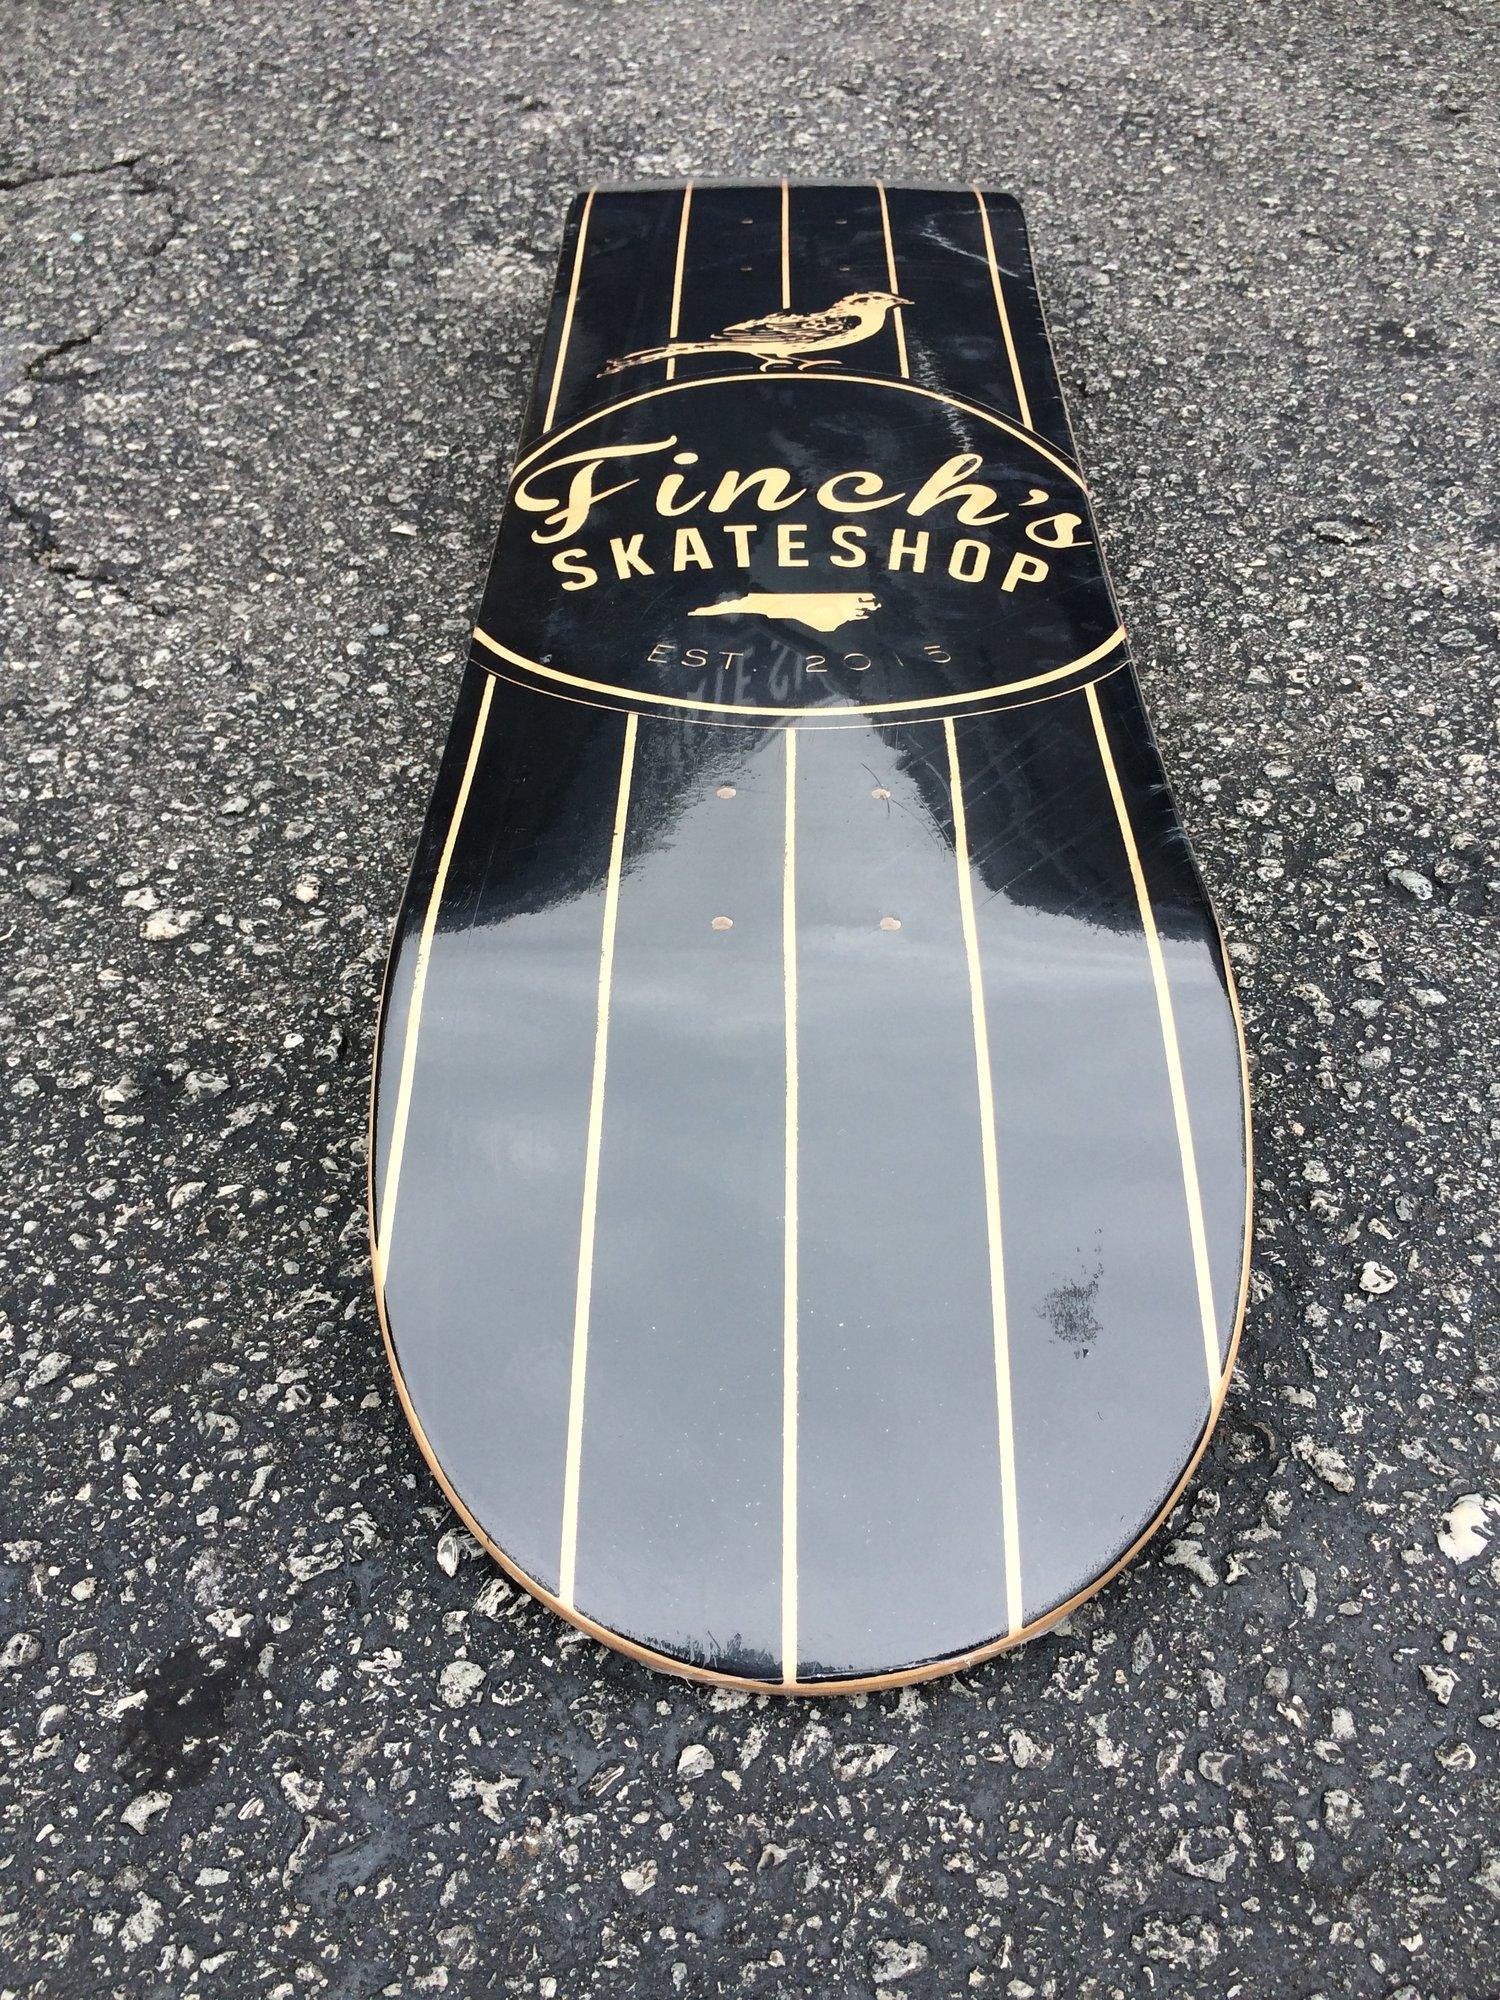 Image of Finch's Skate Shop Deck